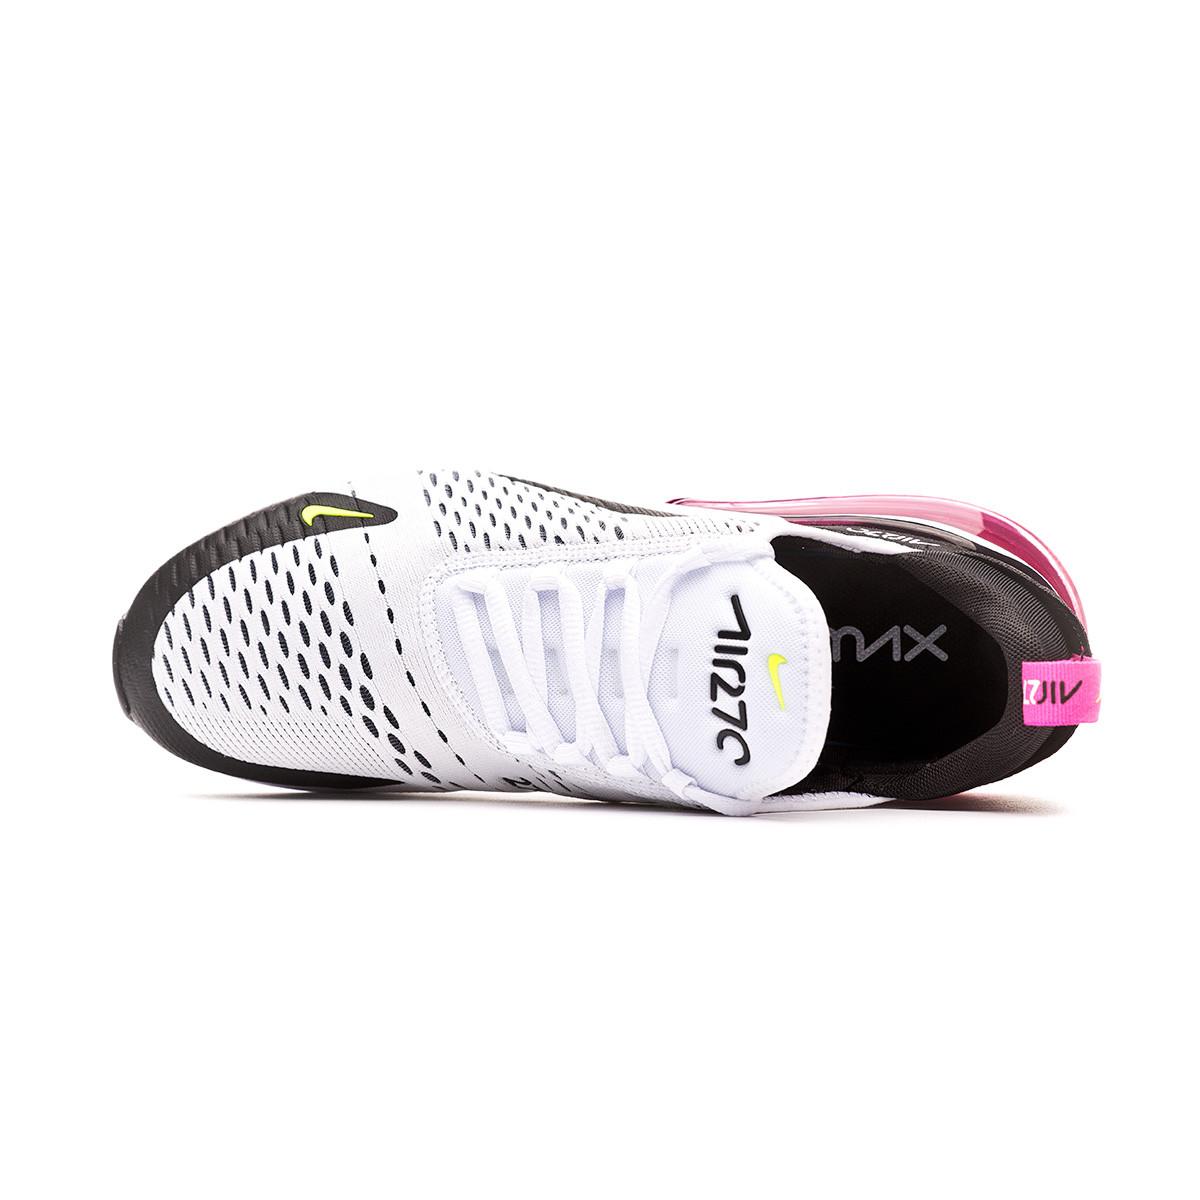 8862f1cd29f6d Trainers Nike Air Max 270 White-Volt-Black-Laser fuchsia - Football store  Fútbol Emotion